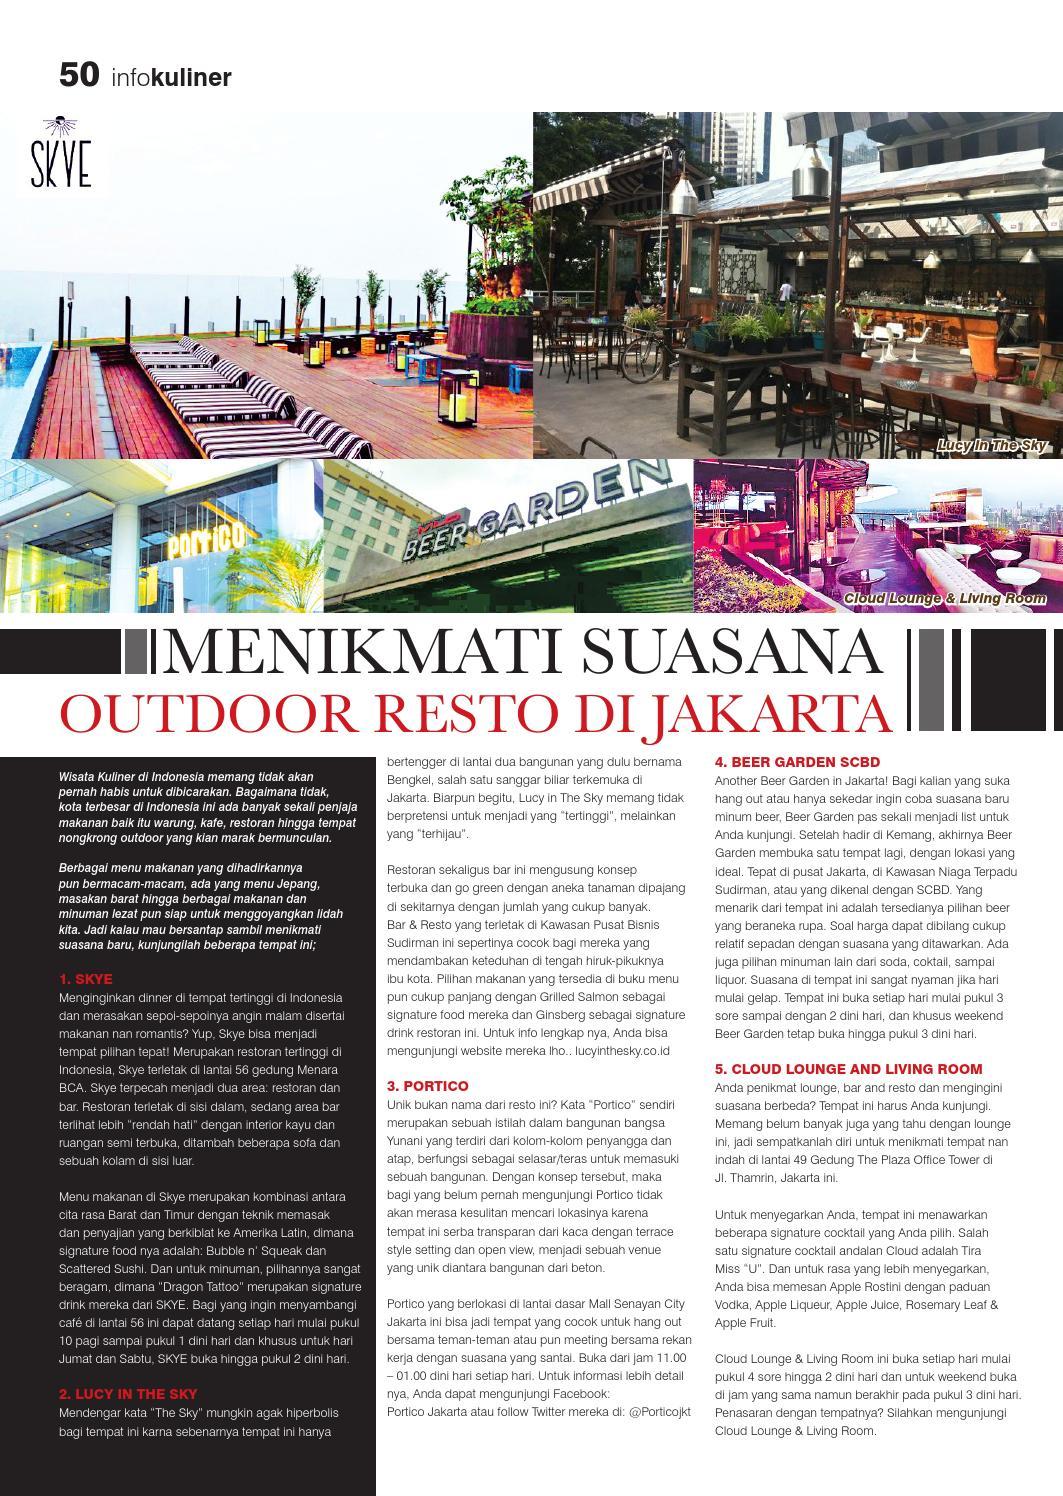 Buletin Indo July 2014 By Buletin Indo Issuu